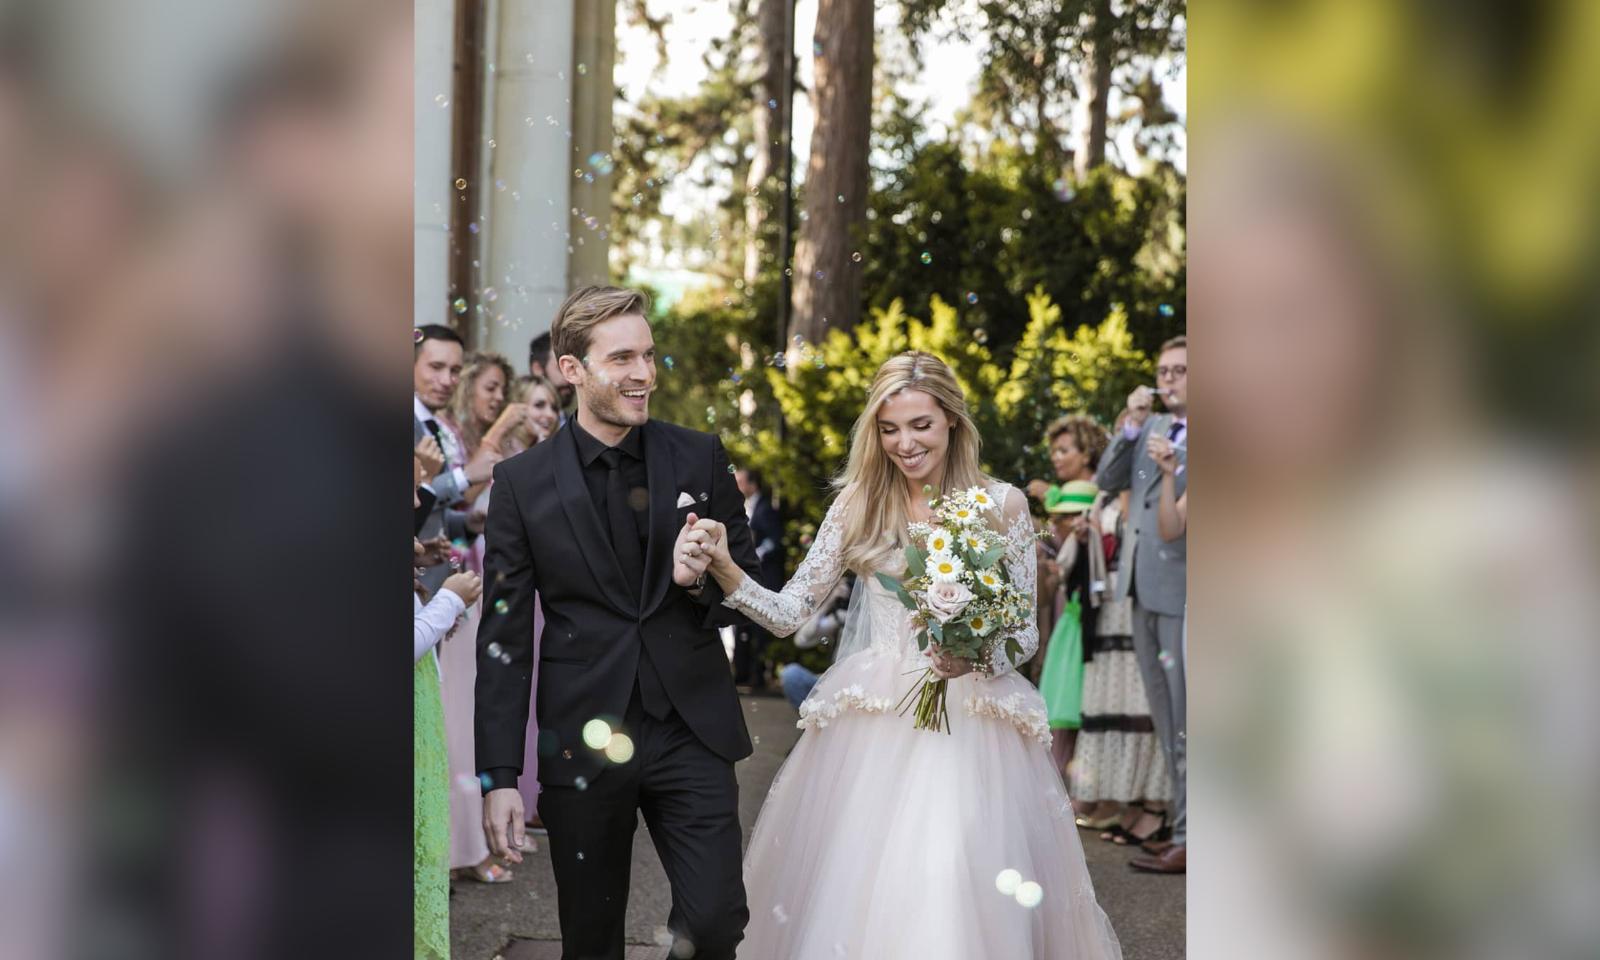 PewDiePie & Marzia Bisognin Are Married